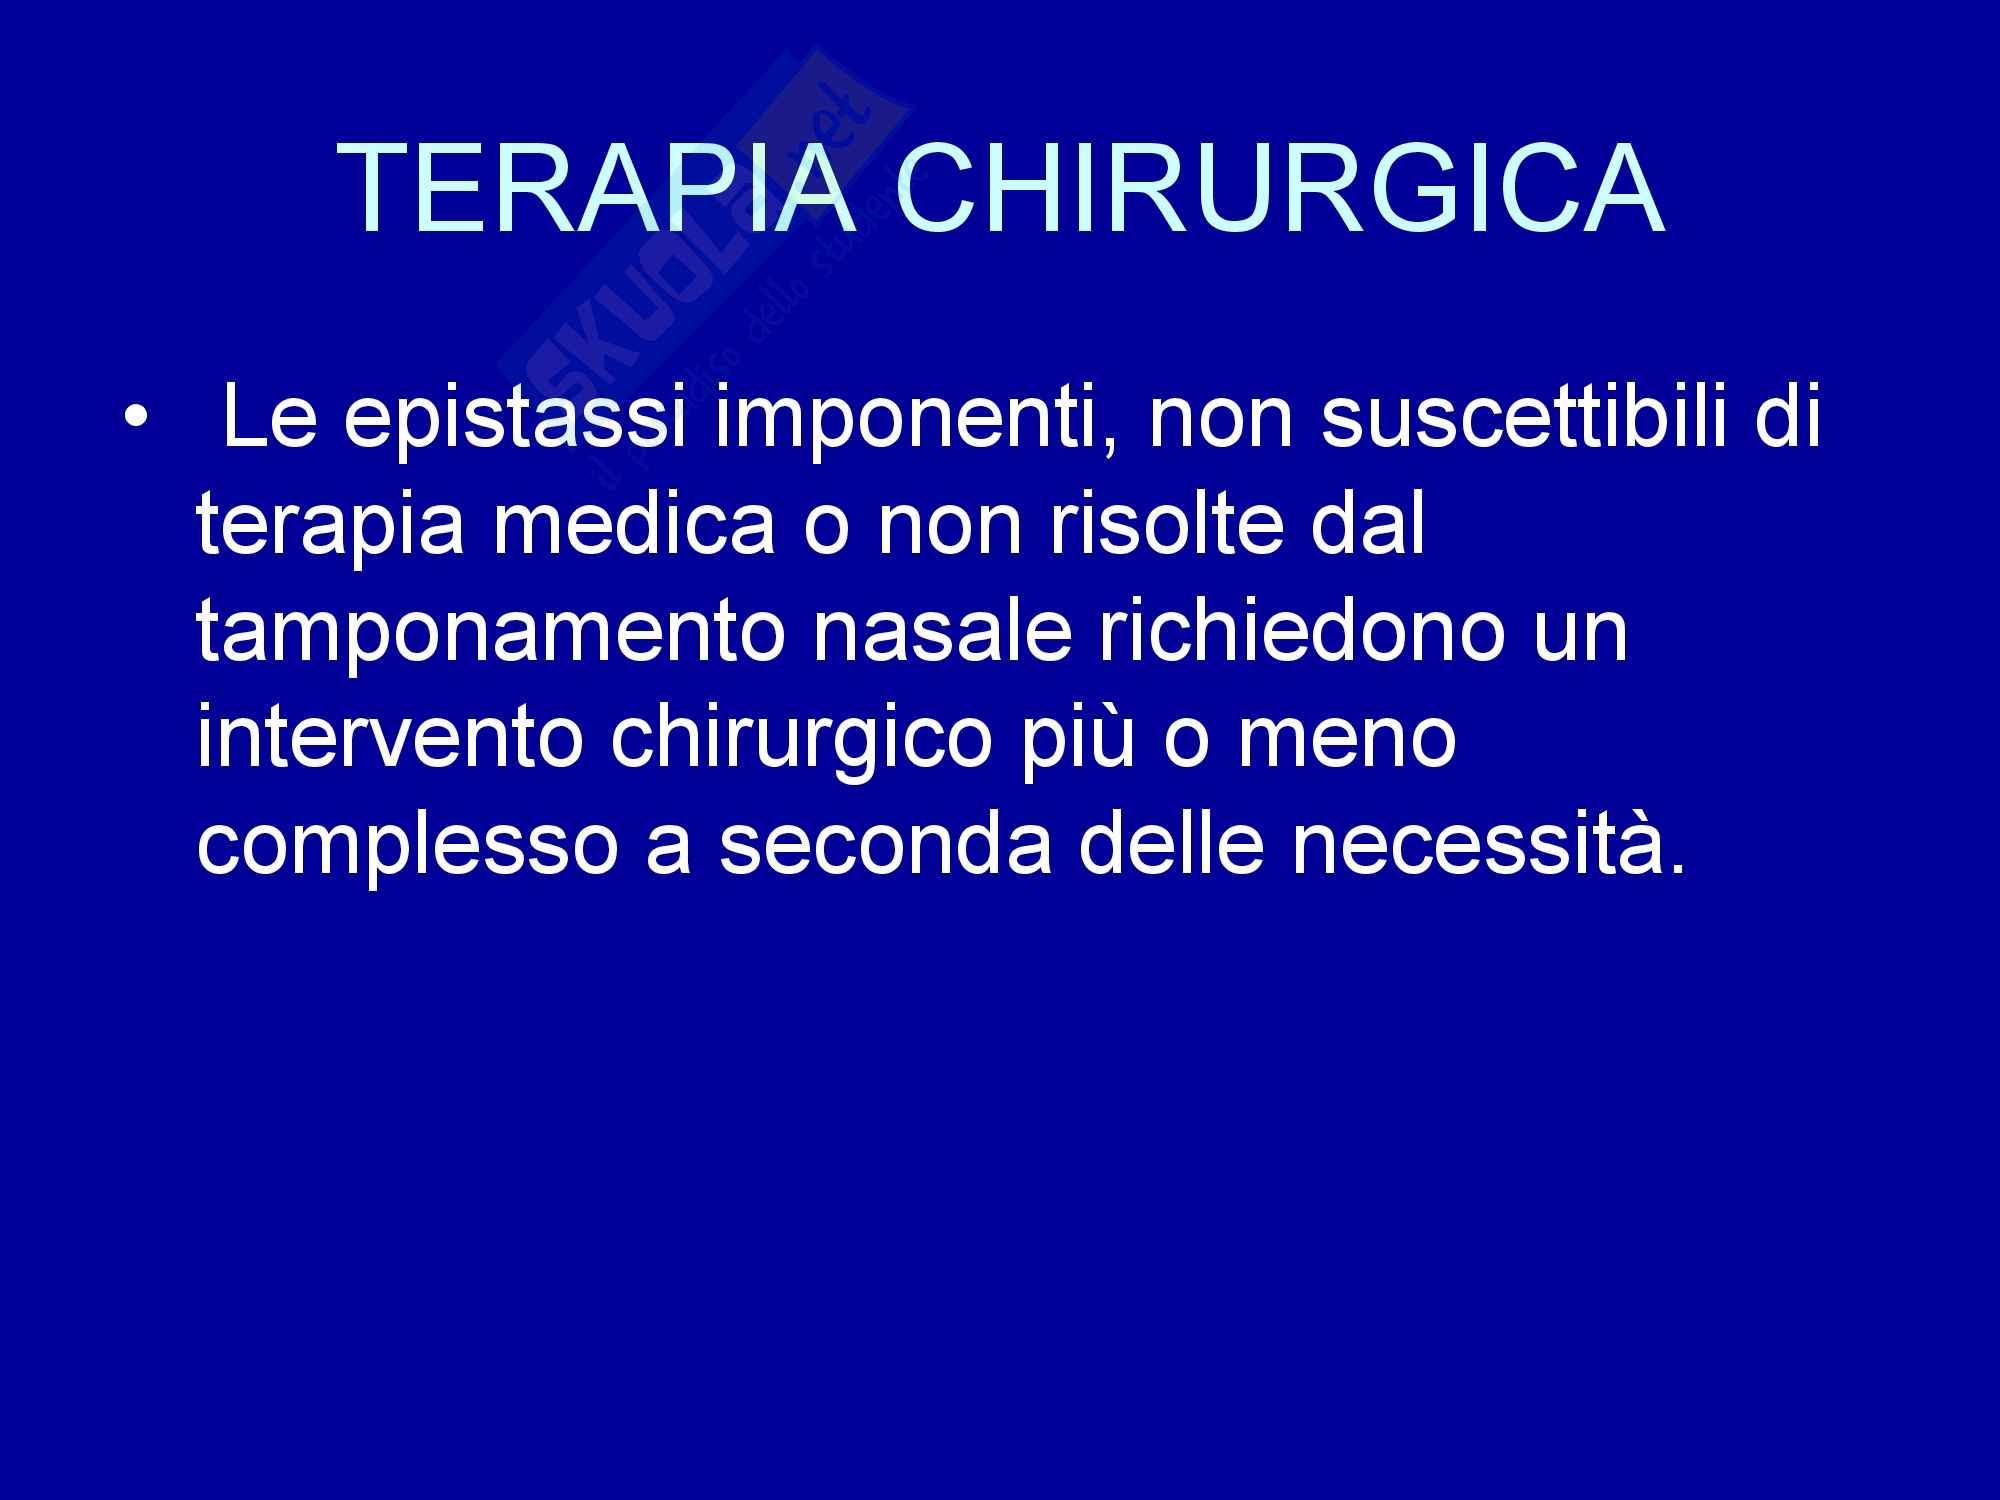 Otorinolaringoiatria - Epistassi Pag. 11